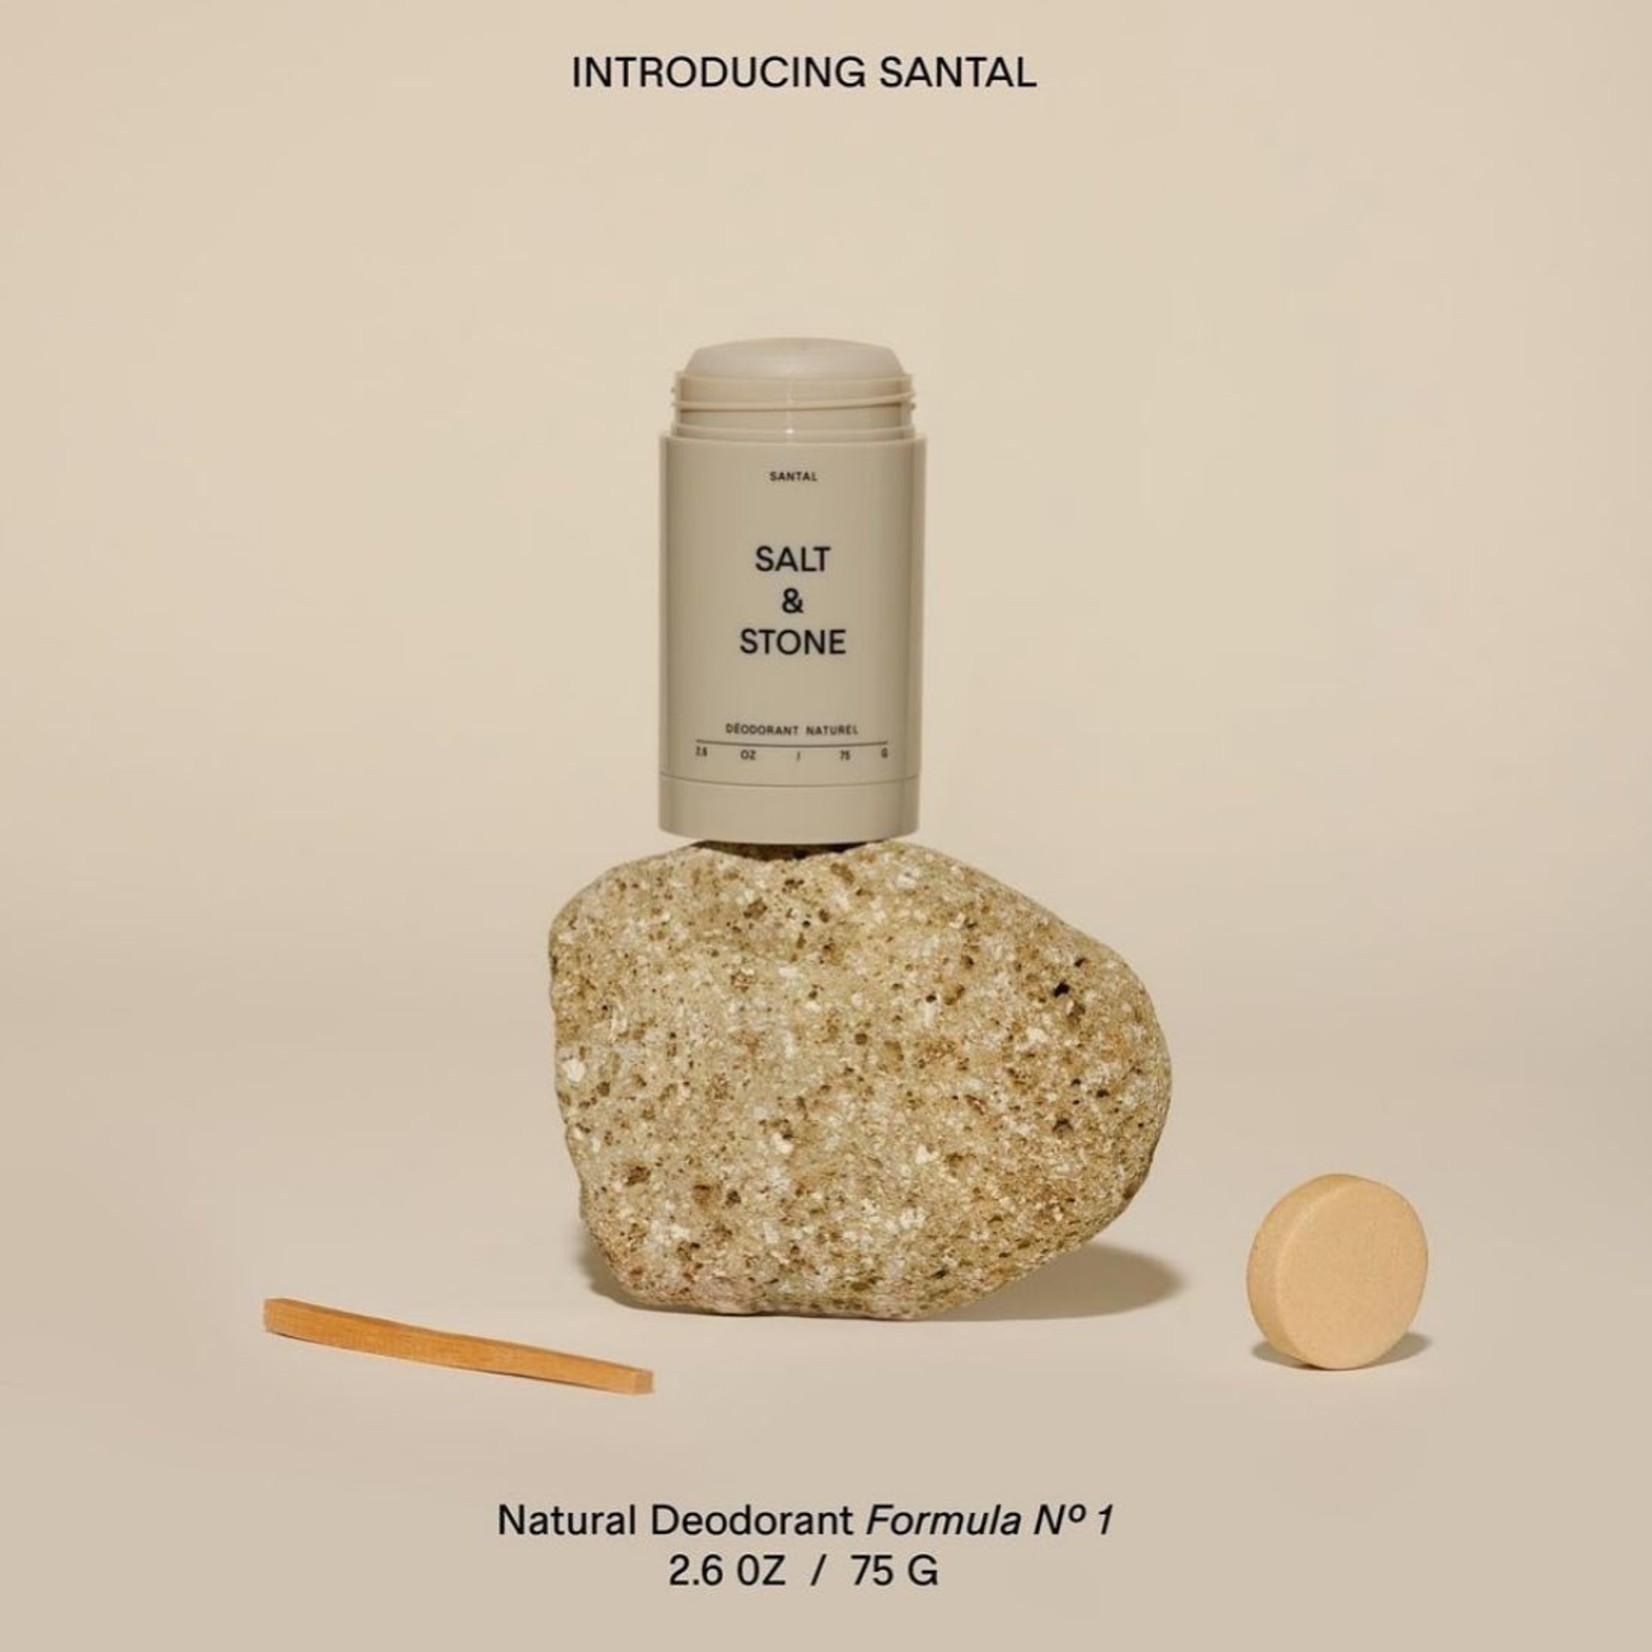 SALT & STONE DEODORANT SANTAL - NATURAL DEODORANT